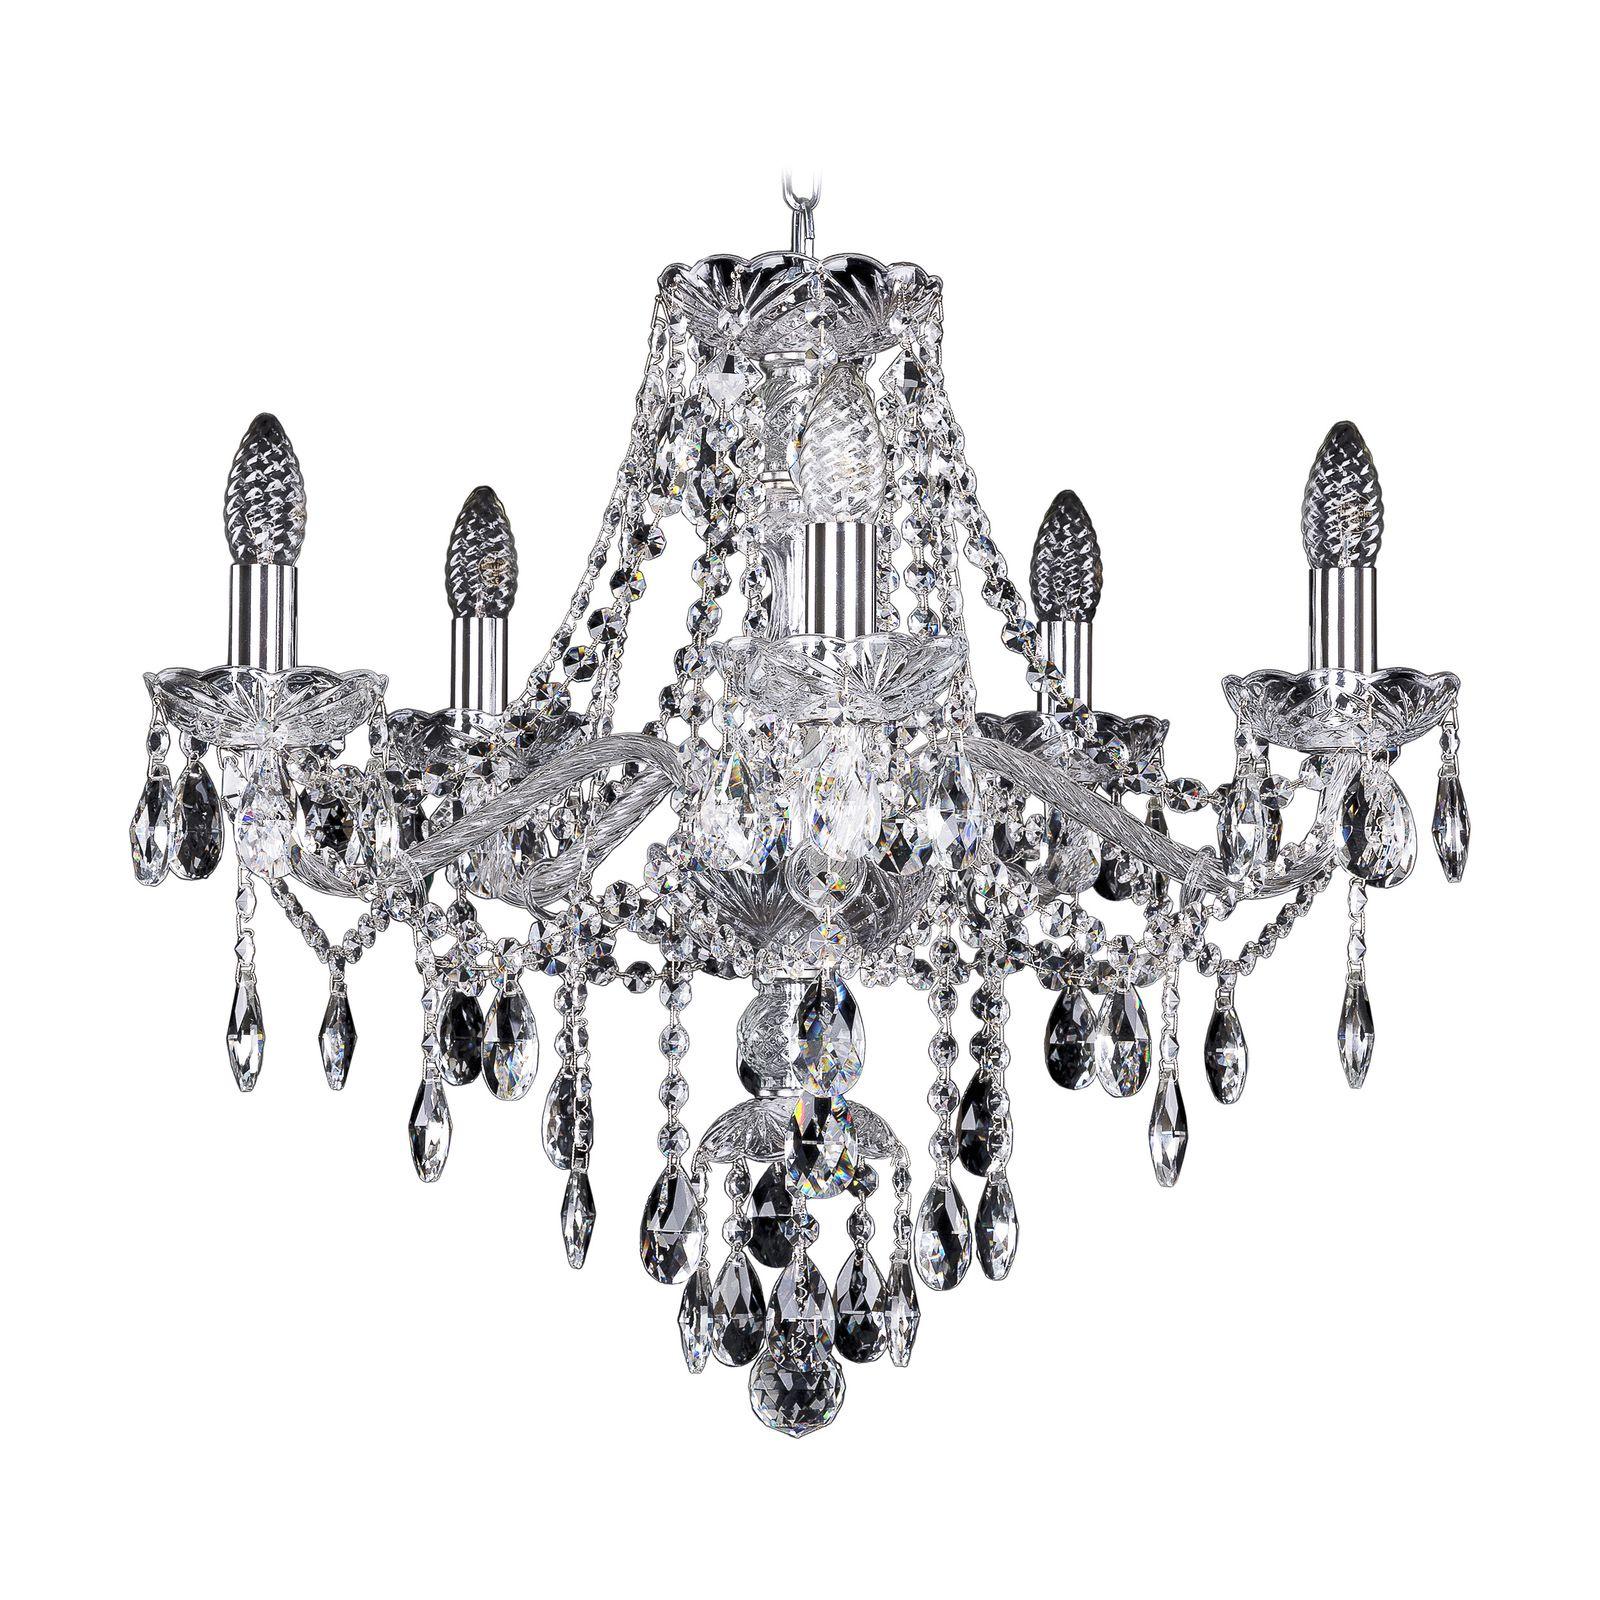 Потолочный светильник Bohemia Ivele Crystal 1415/5/200 Ni, E14, 40 Вт bohemia ivele crystal 1932 75z g